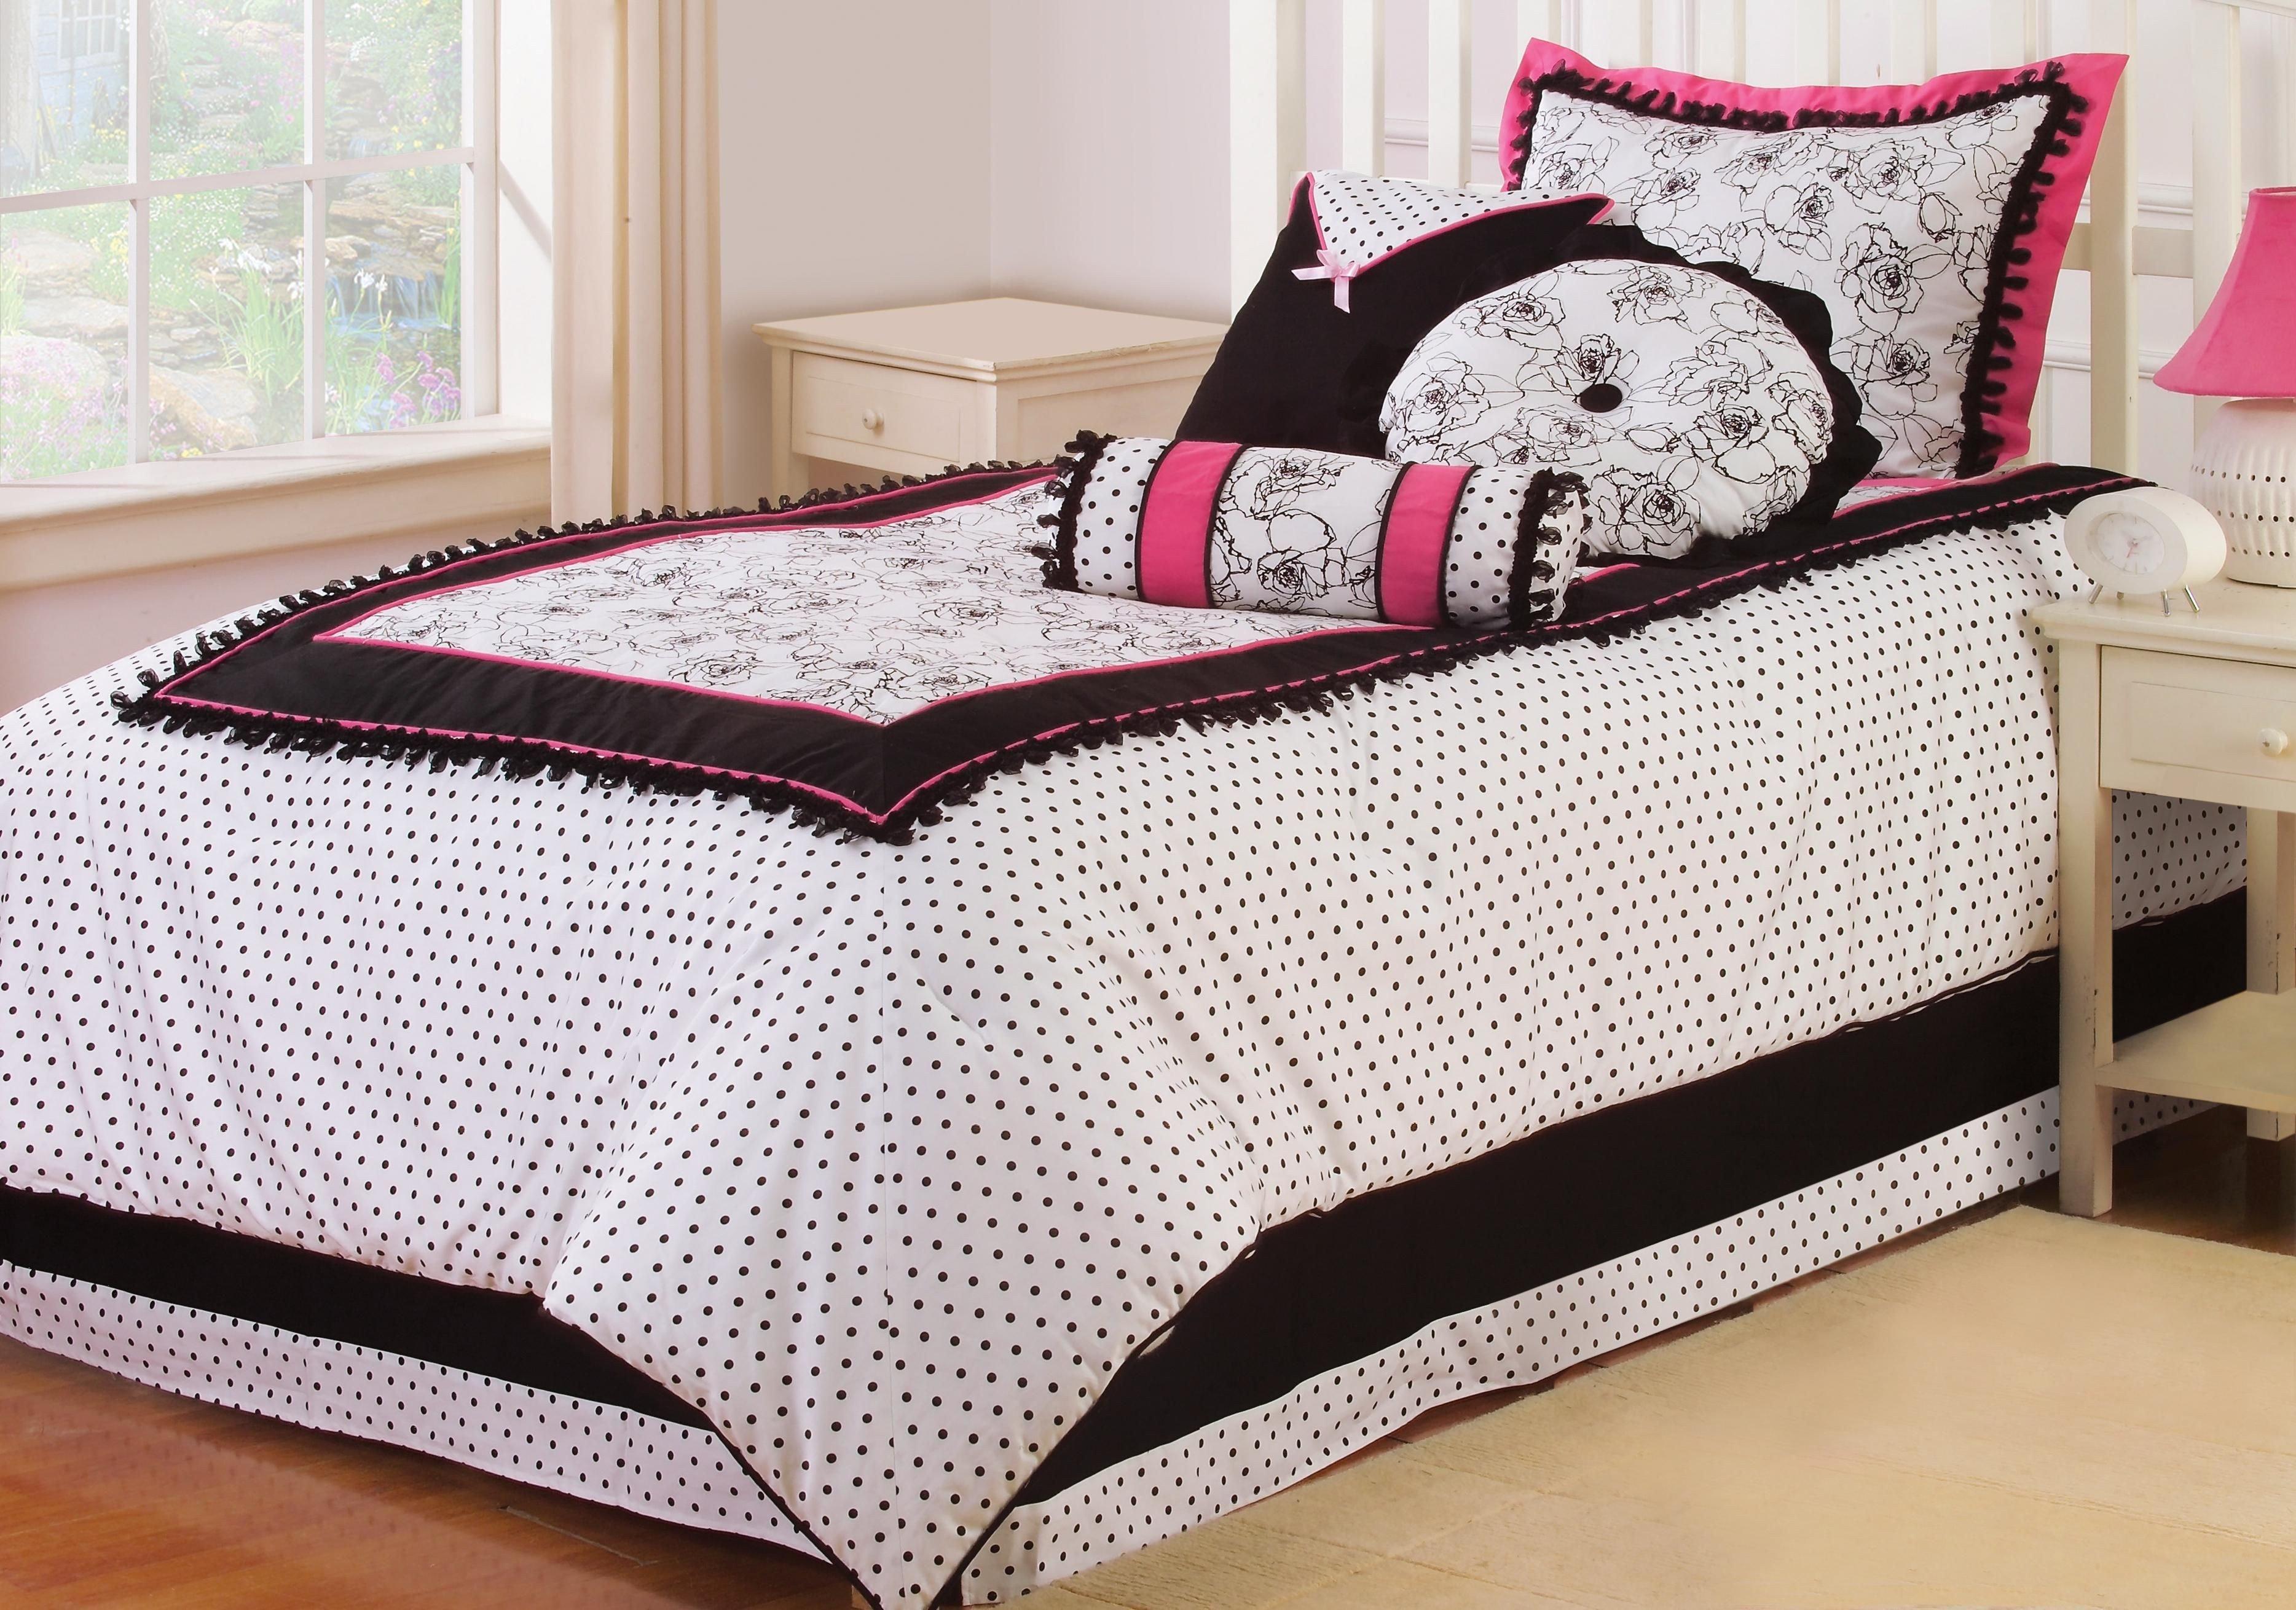 Kathy Ireland Bedroom Furniture Elegant Kathy Ireland Abigale Three Piece Bed Set